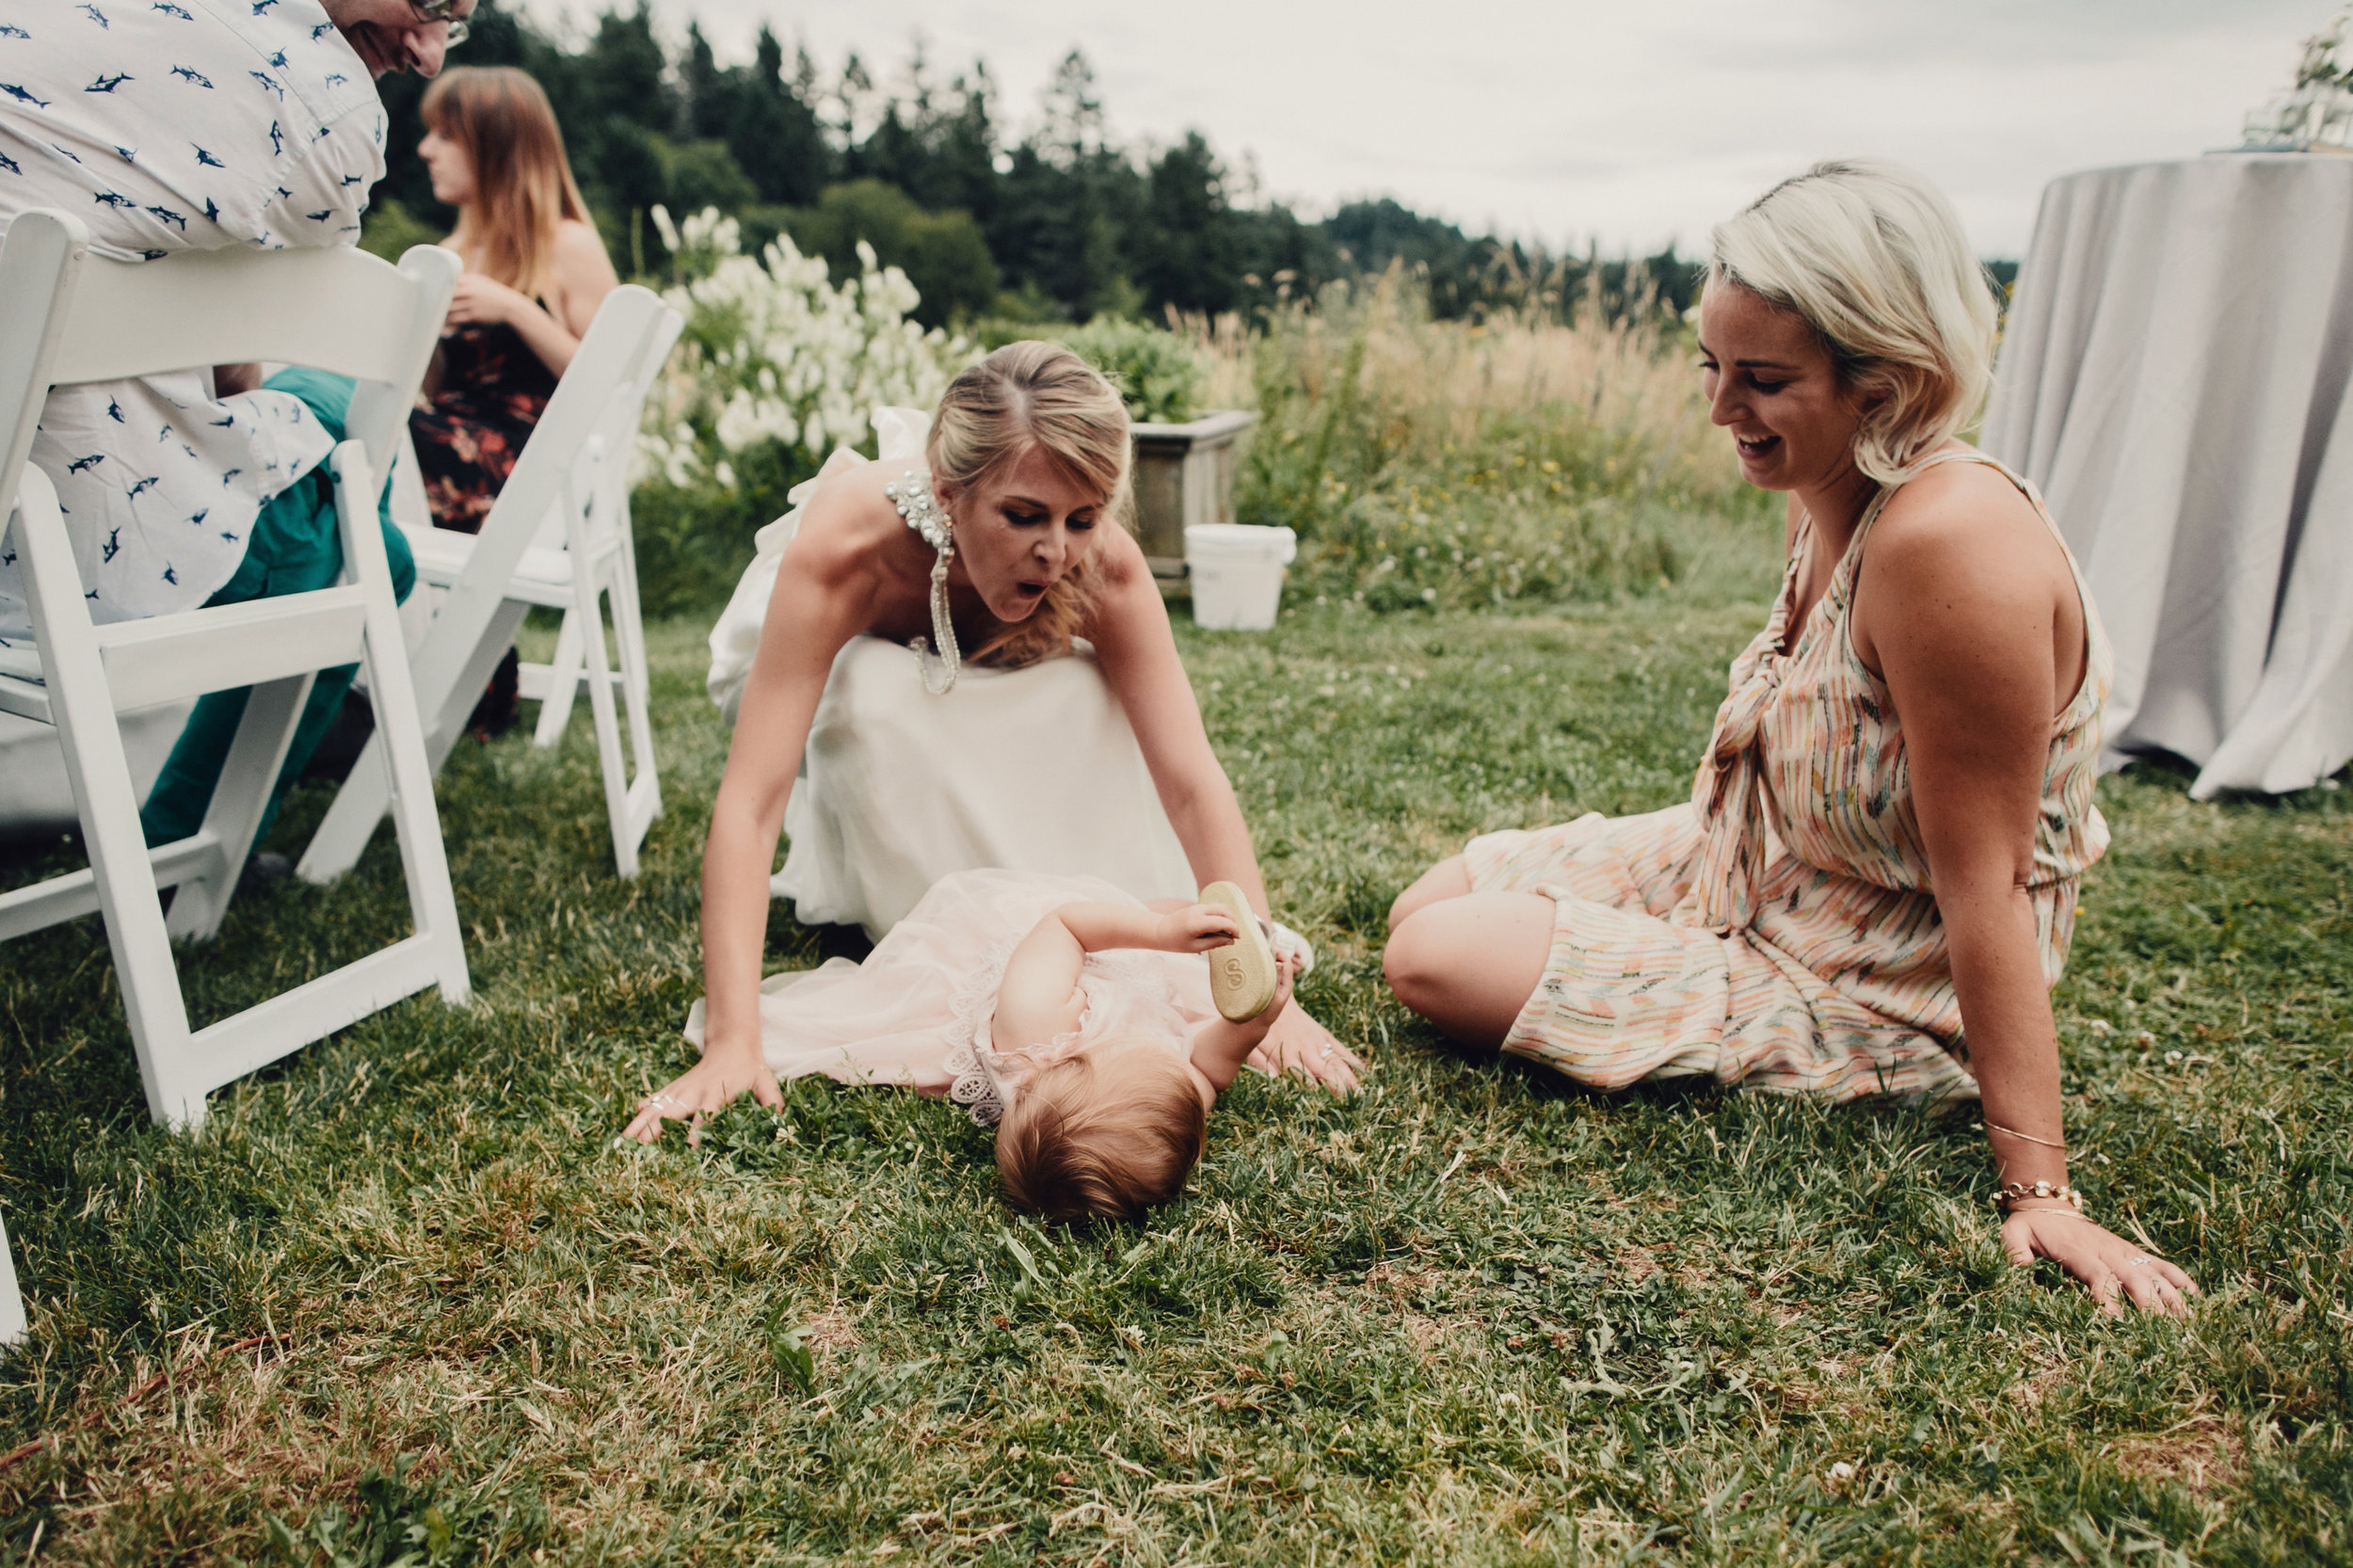 kildara-farms-wedding-photo-inspiration-0083